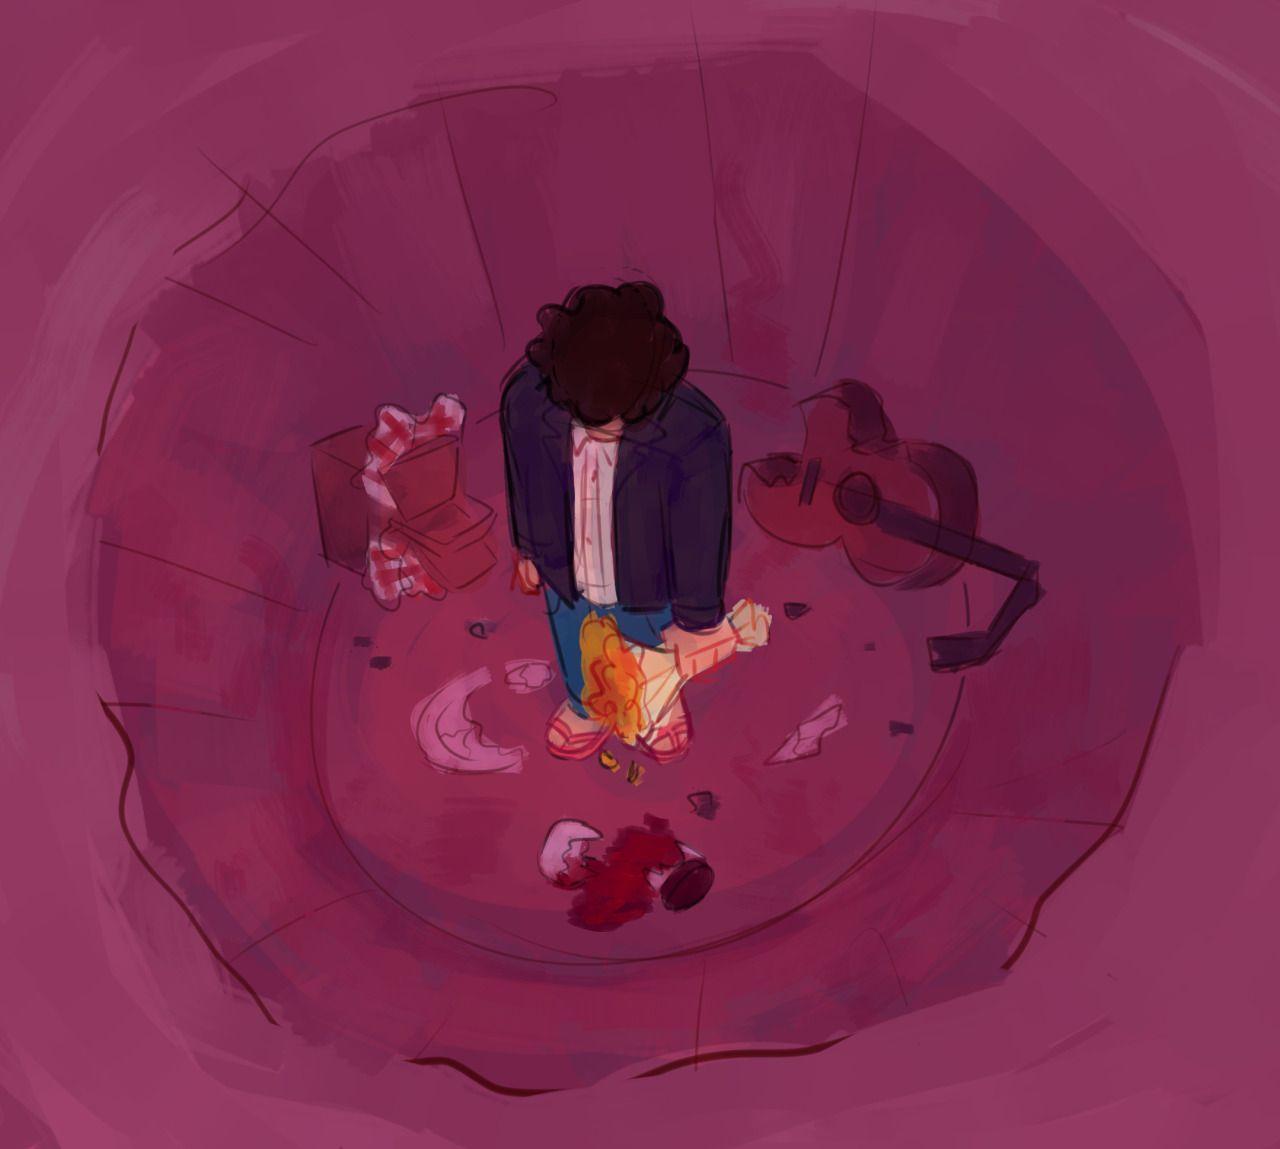 Andy I D Rather Not Be Me In 2020 Steven Universe Fanart Steven Universe Cartoon